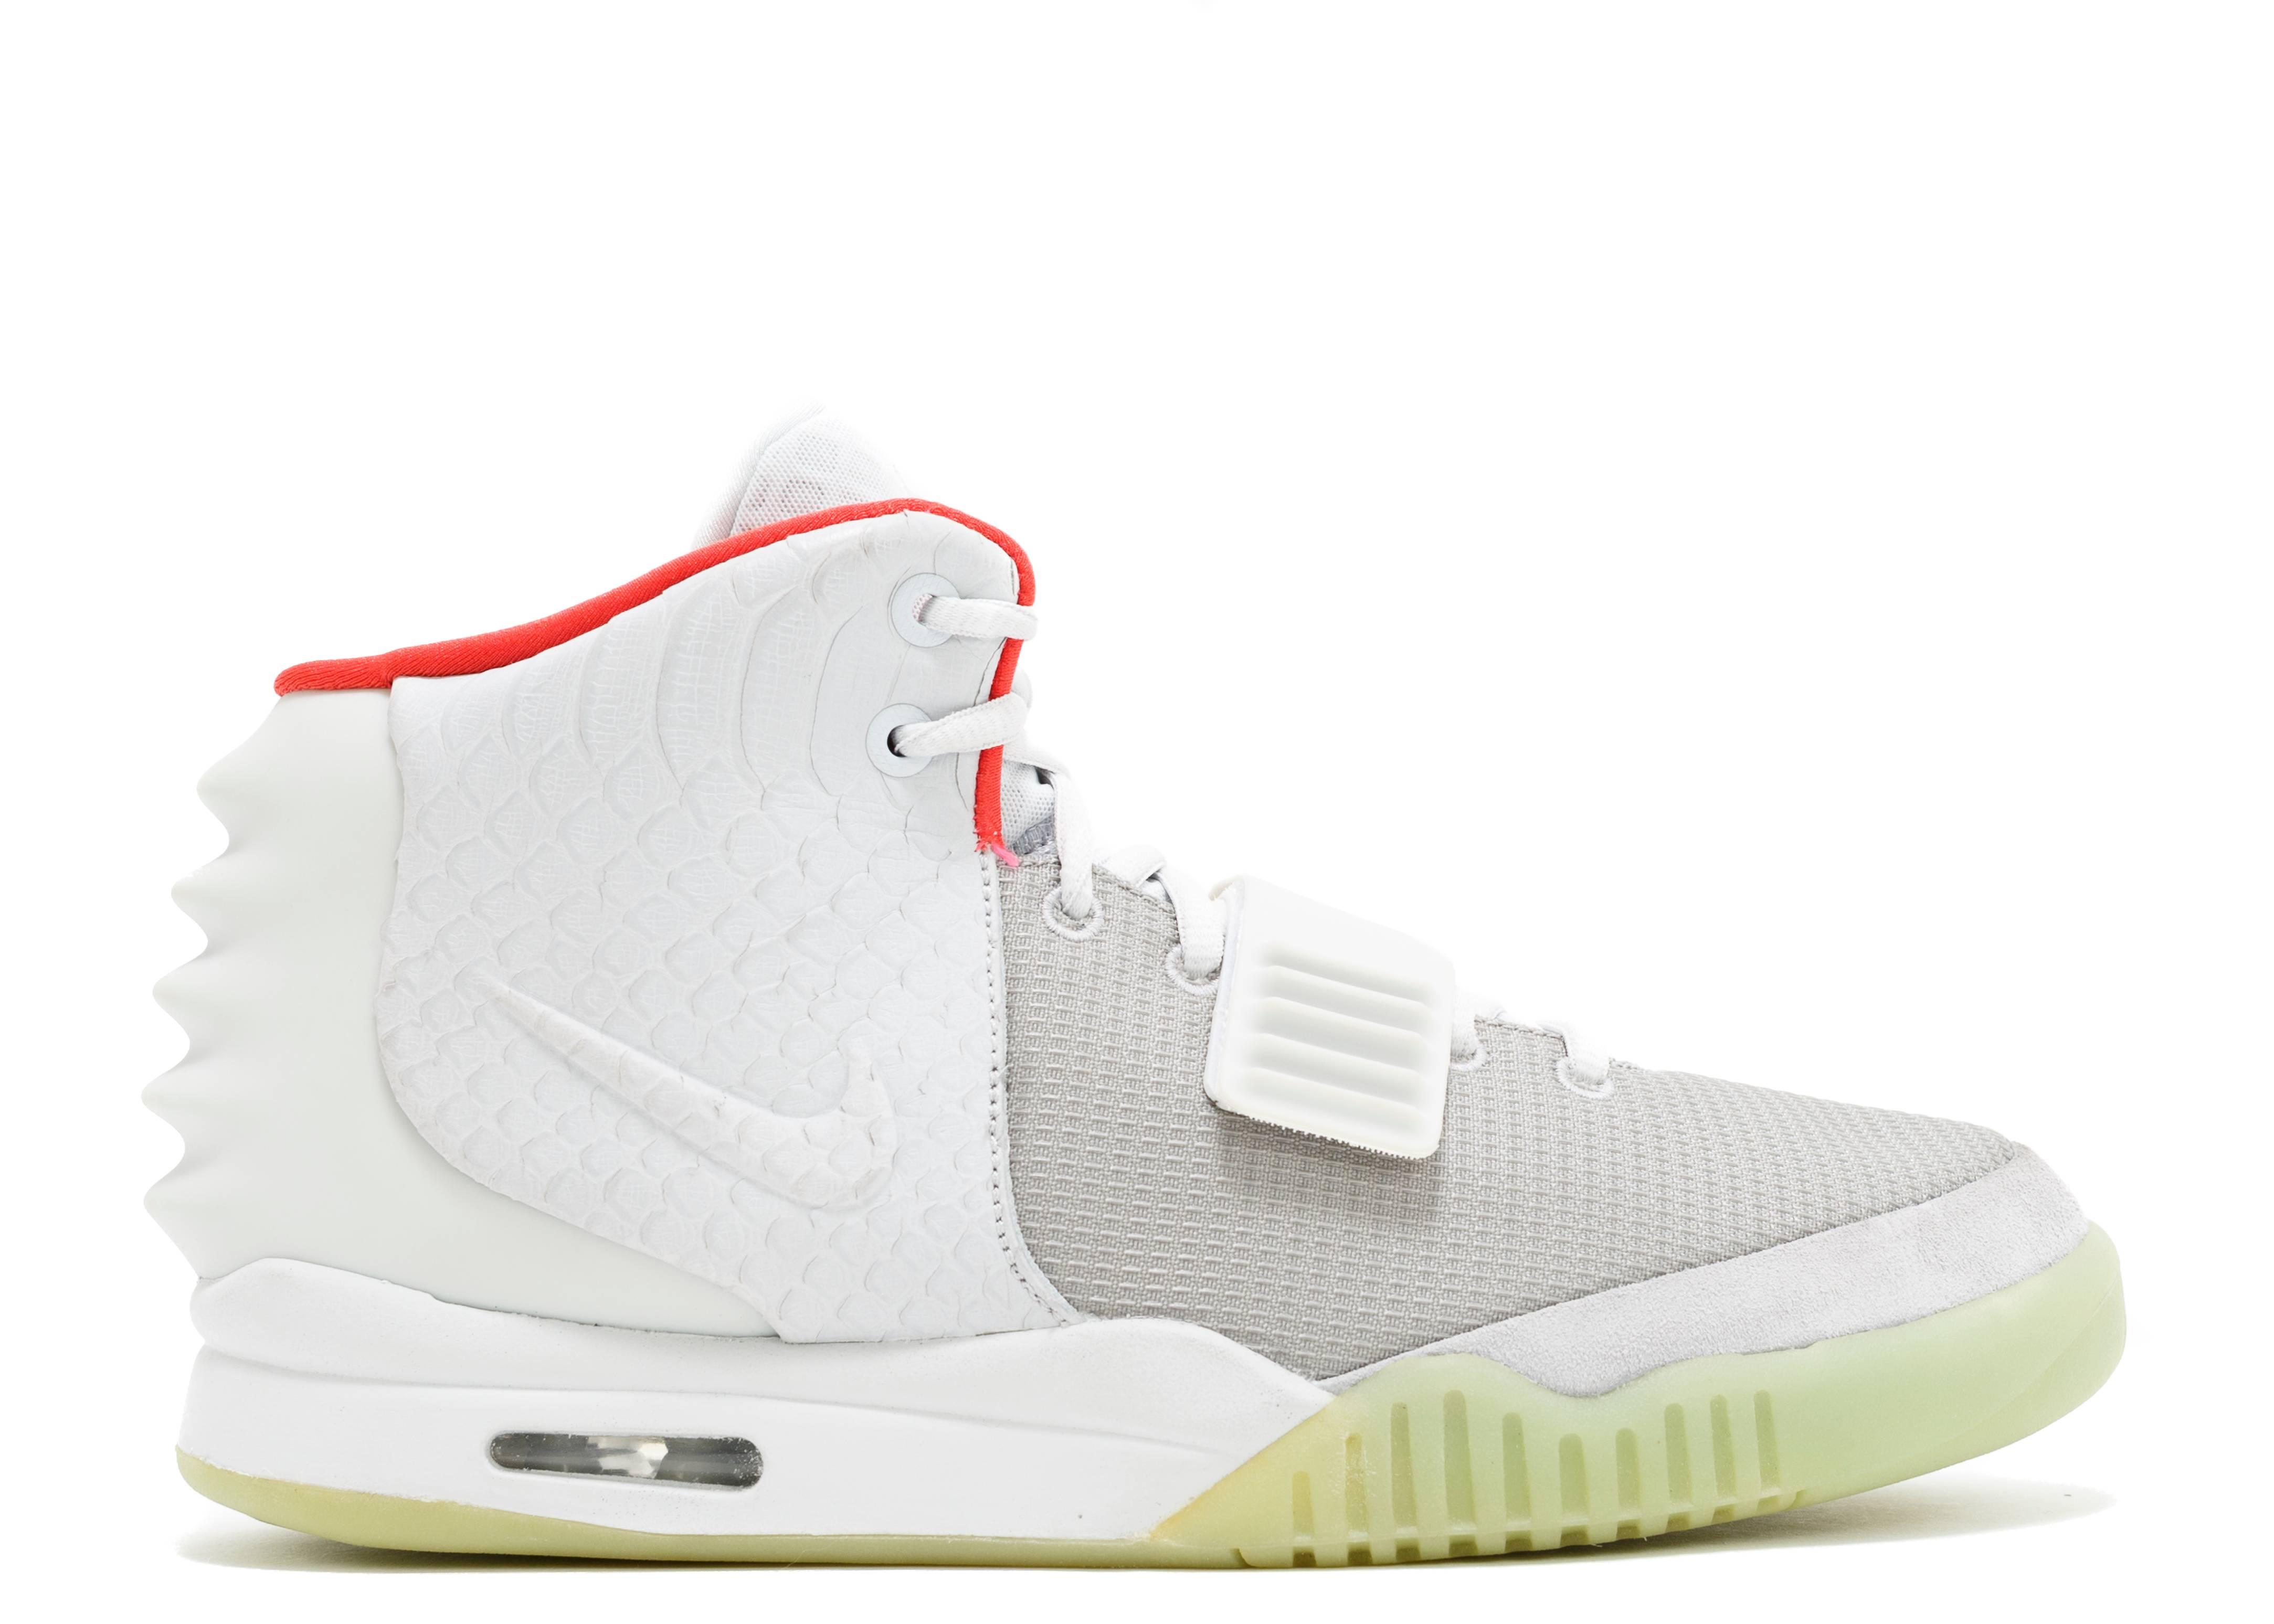 427fa7008cf Sneakers. Here.